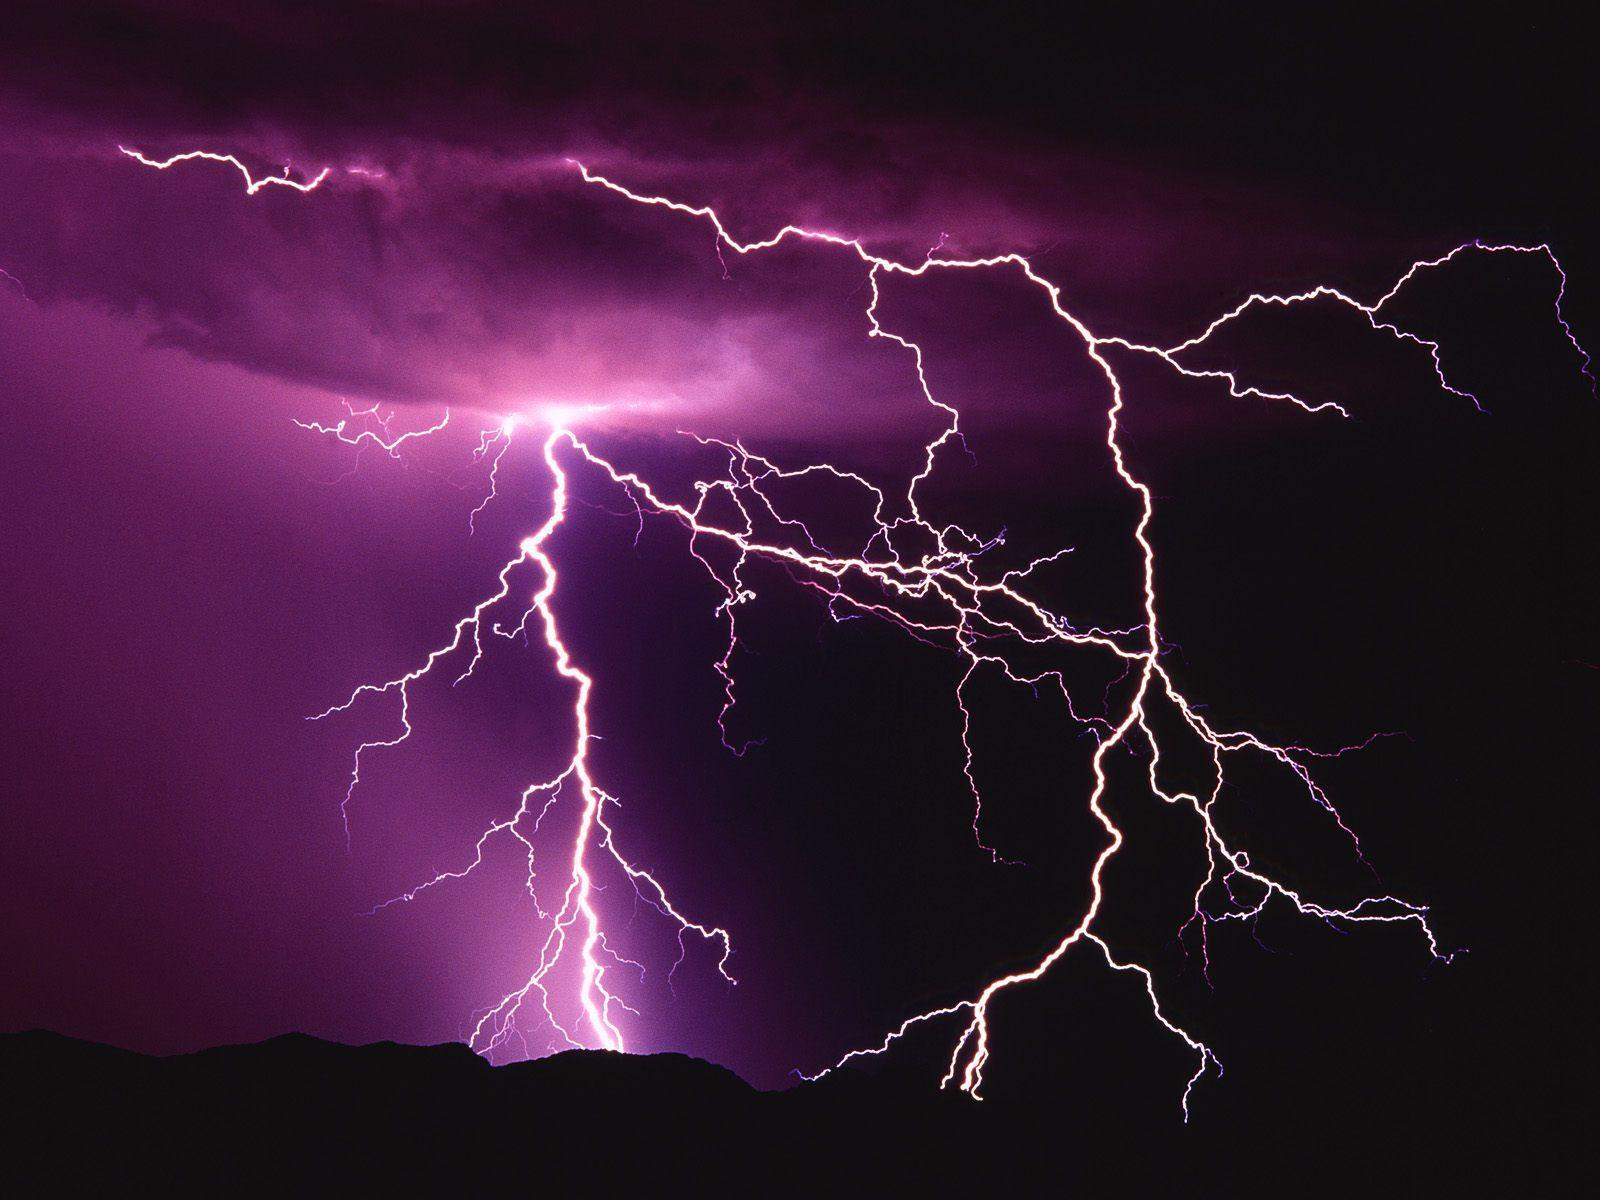 Storm 02